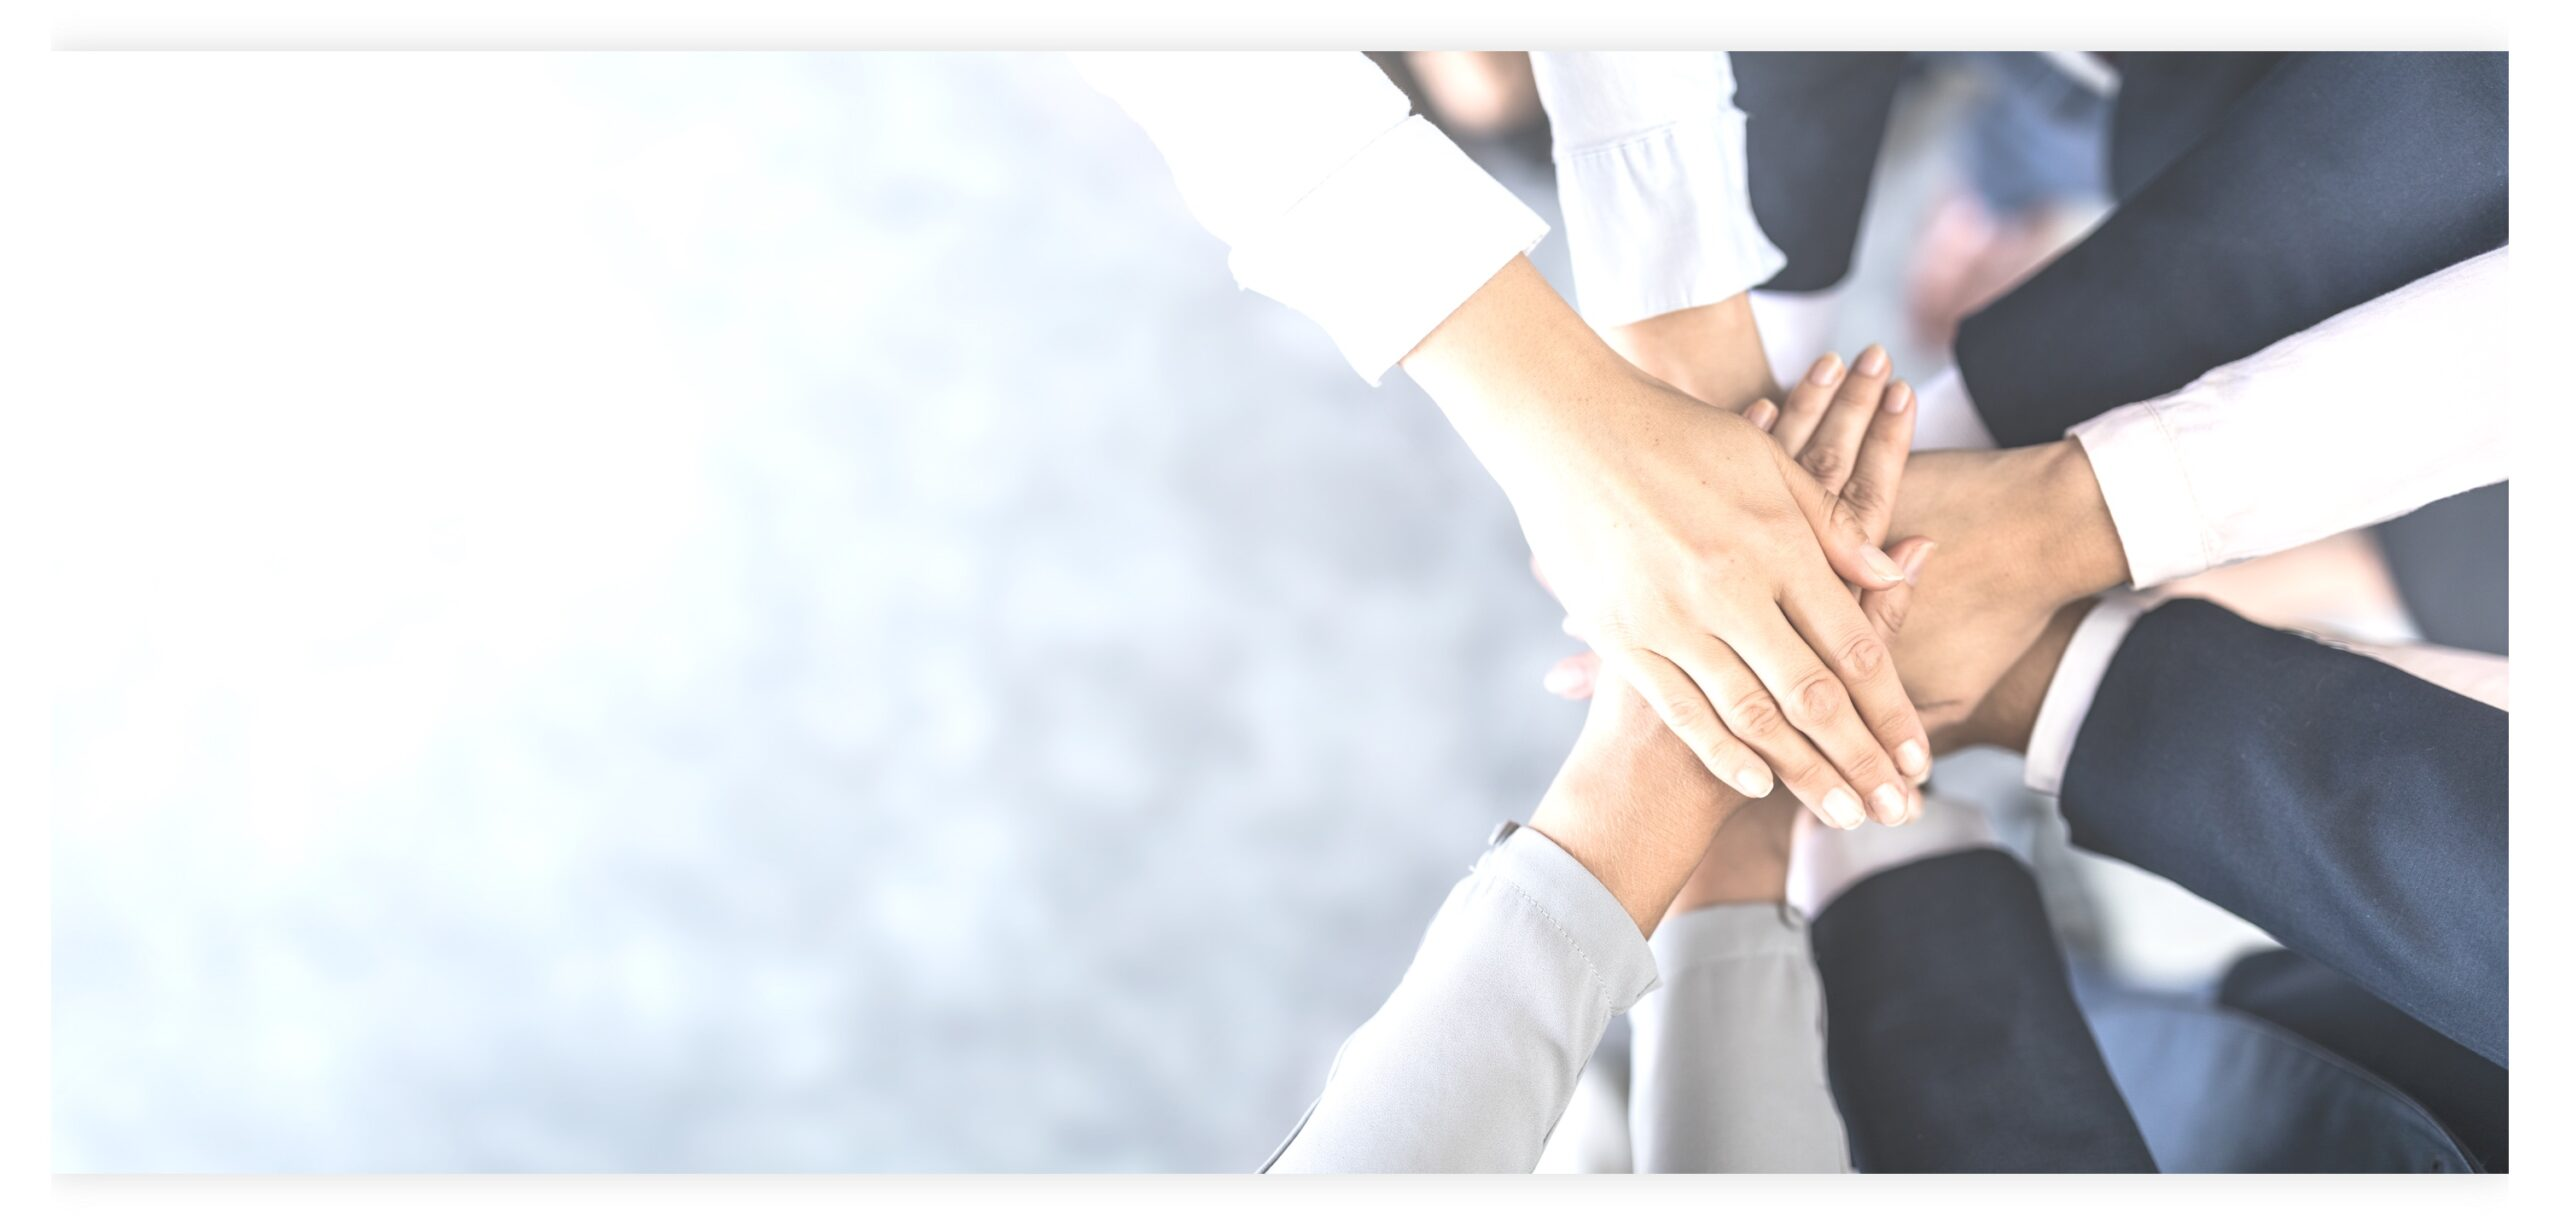 Team unit hands